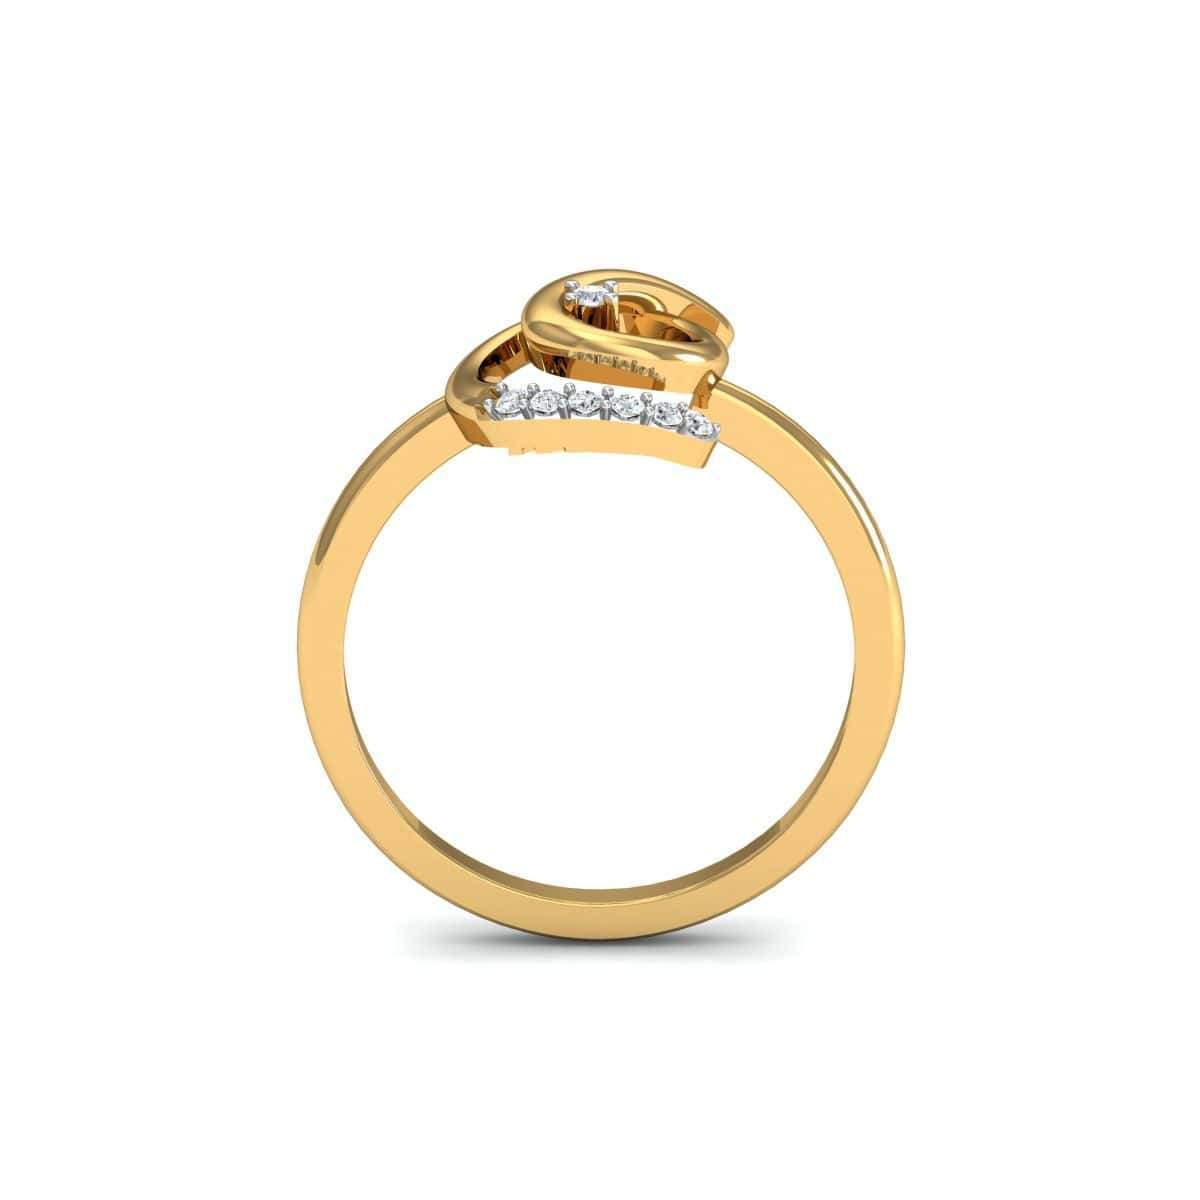 Diamoire Jewels 18kt Yellow Gold Pave 0.04ct Diamond Infinity Ring IV - UK G 1/4 - US 3 1/2 - EU 45 3/4 KEjUwh4tR